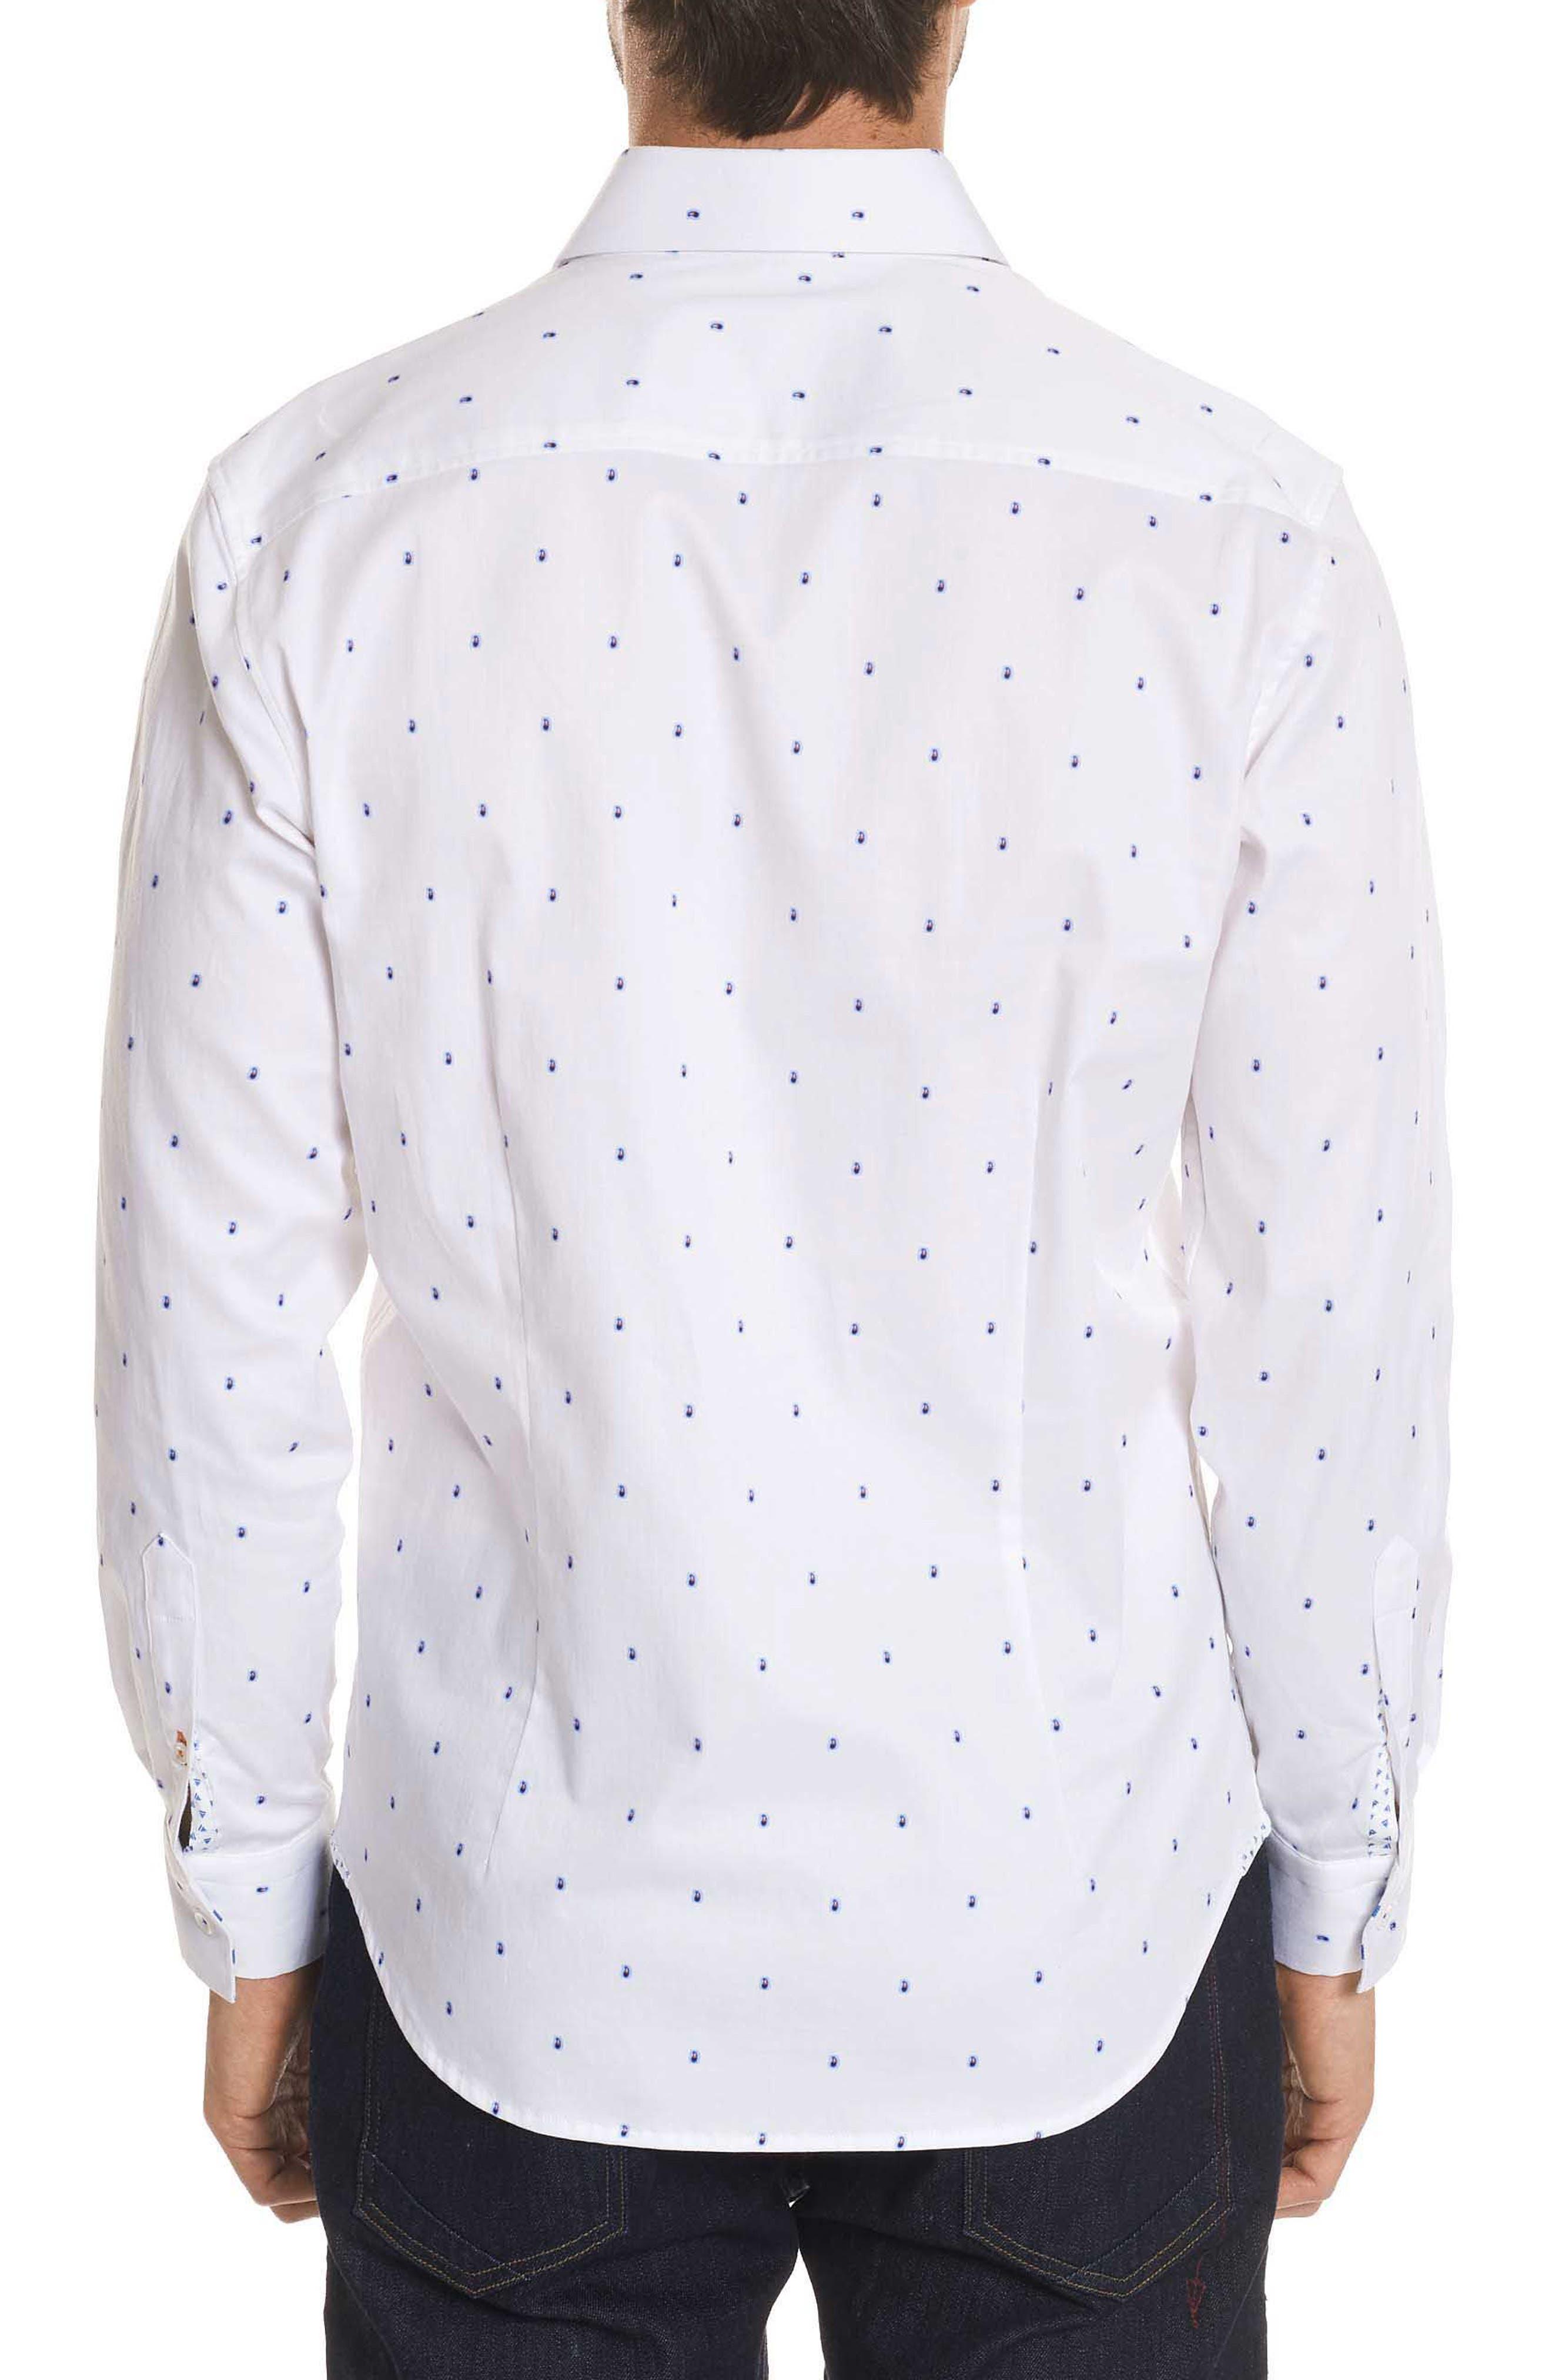 Mack Tailored Fit Sport Shirt,                             Alternate thumbnail 2, color,                             100